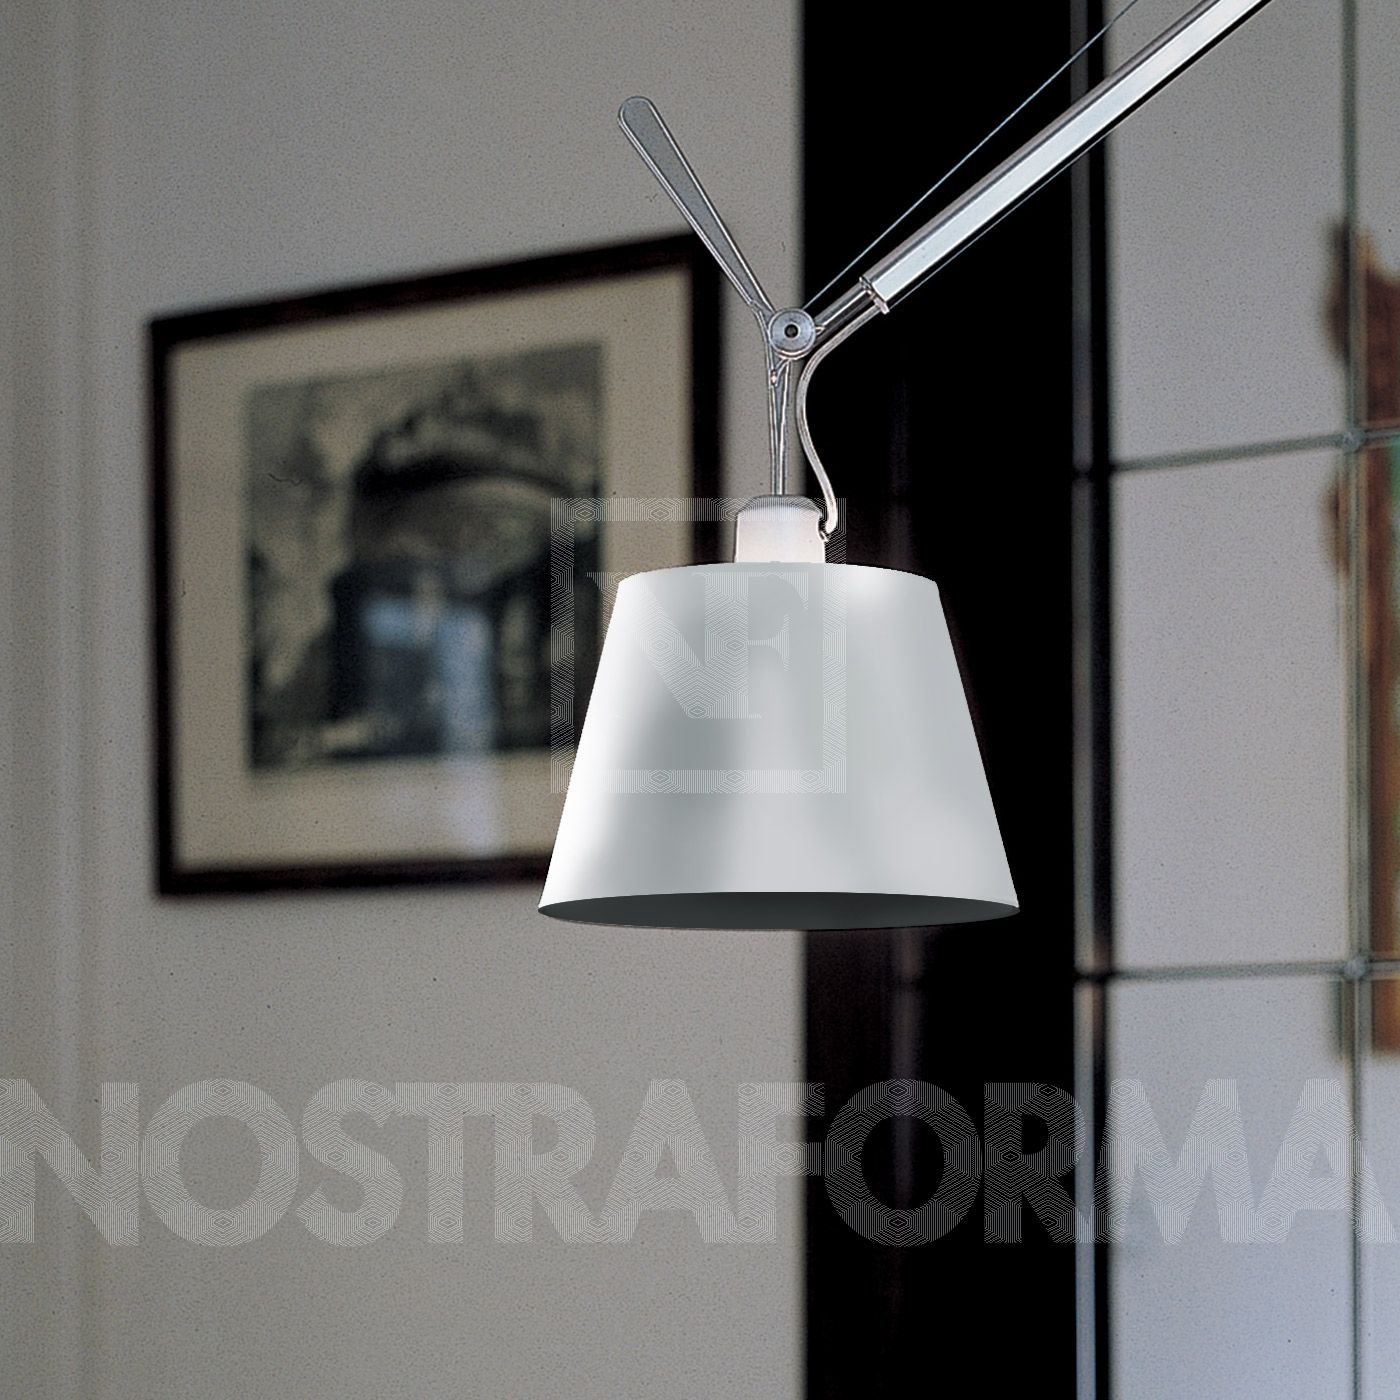 Artemide Tolomeo Mega Terra Stehleuchte Design Leuchten Lampen Mobel Bei Nostraforma Stehleuchte Design Design Leuchten Und Lampen